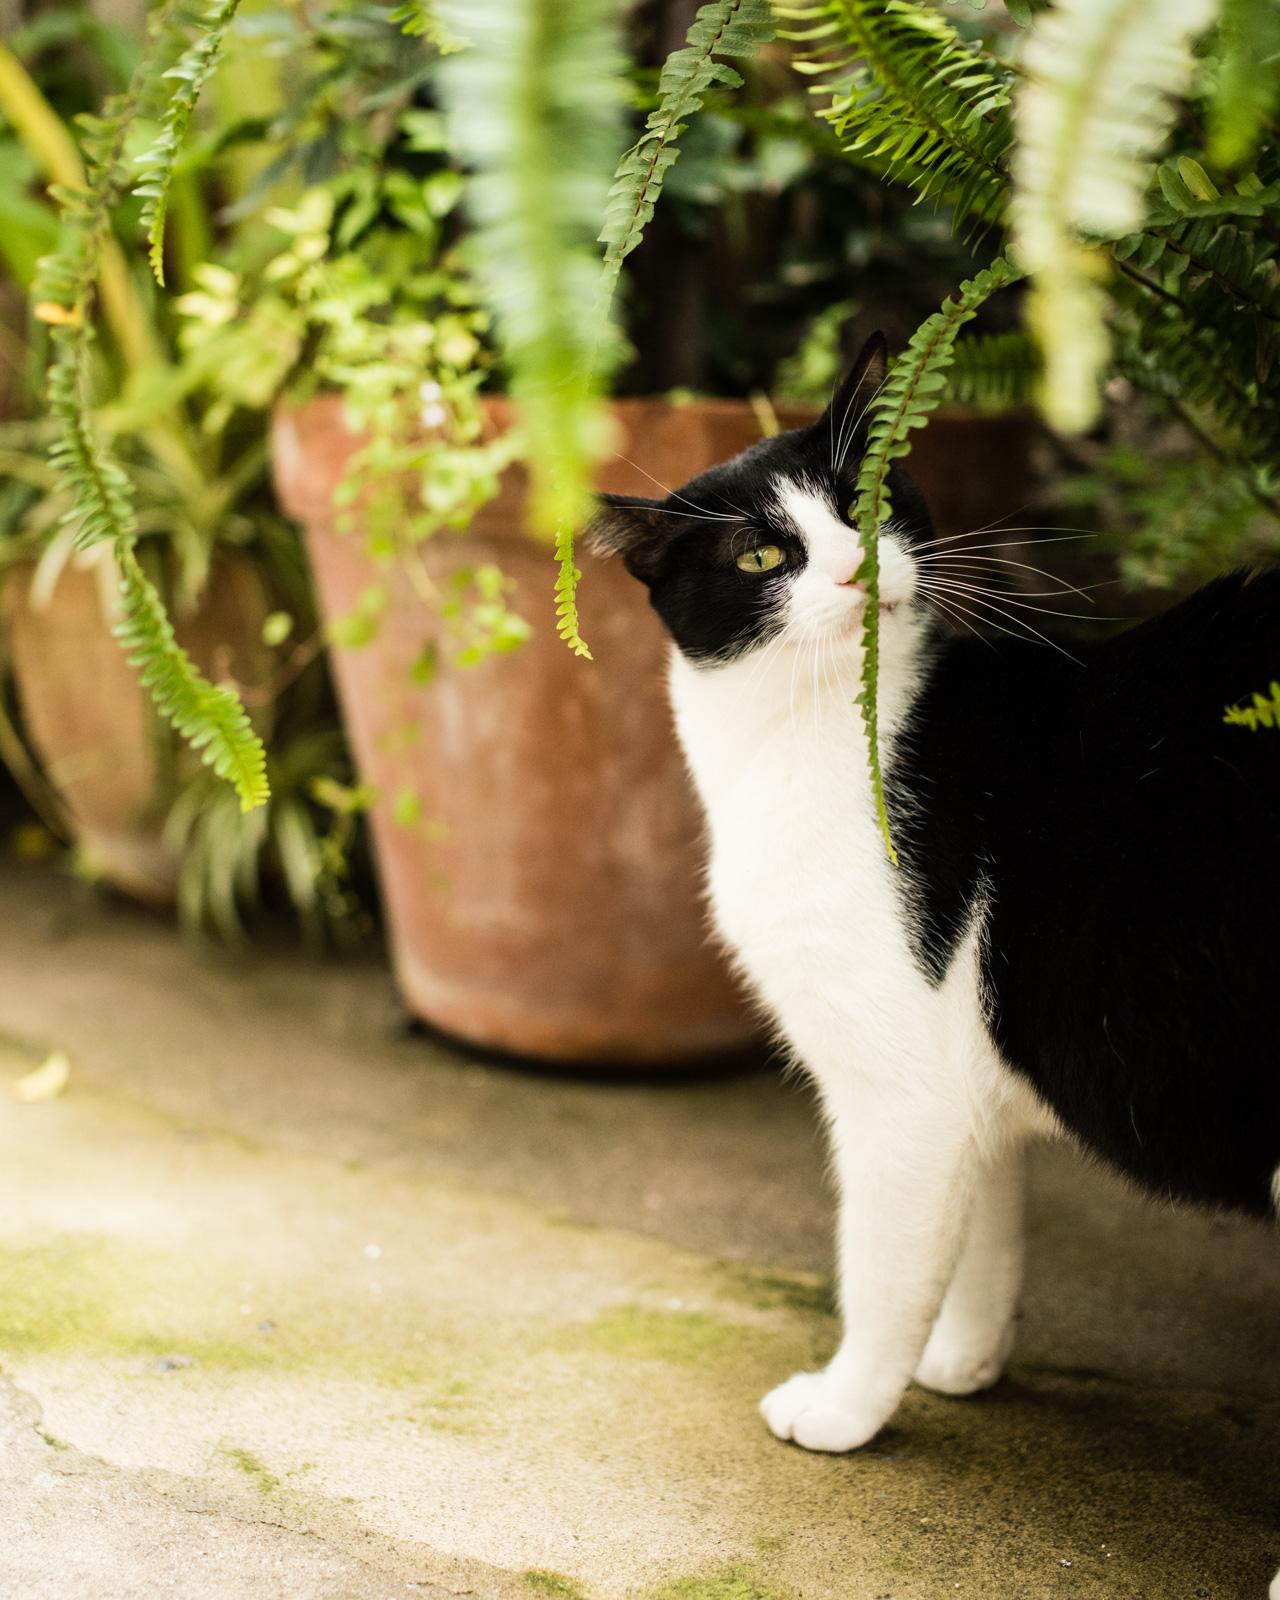 Fern Kitty.jpg